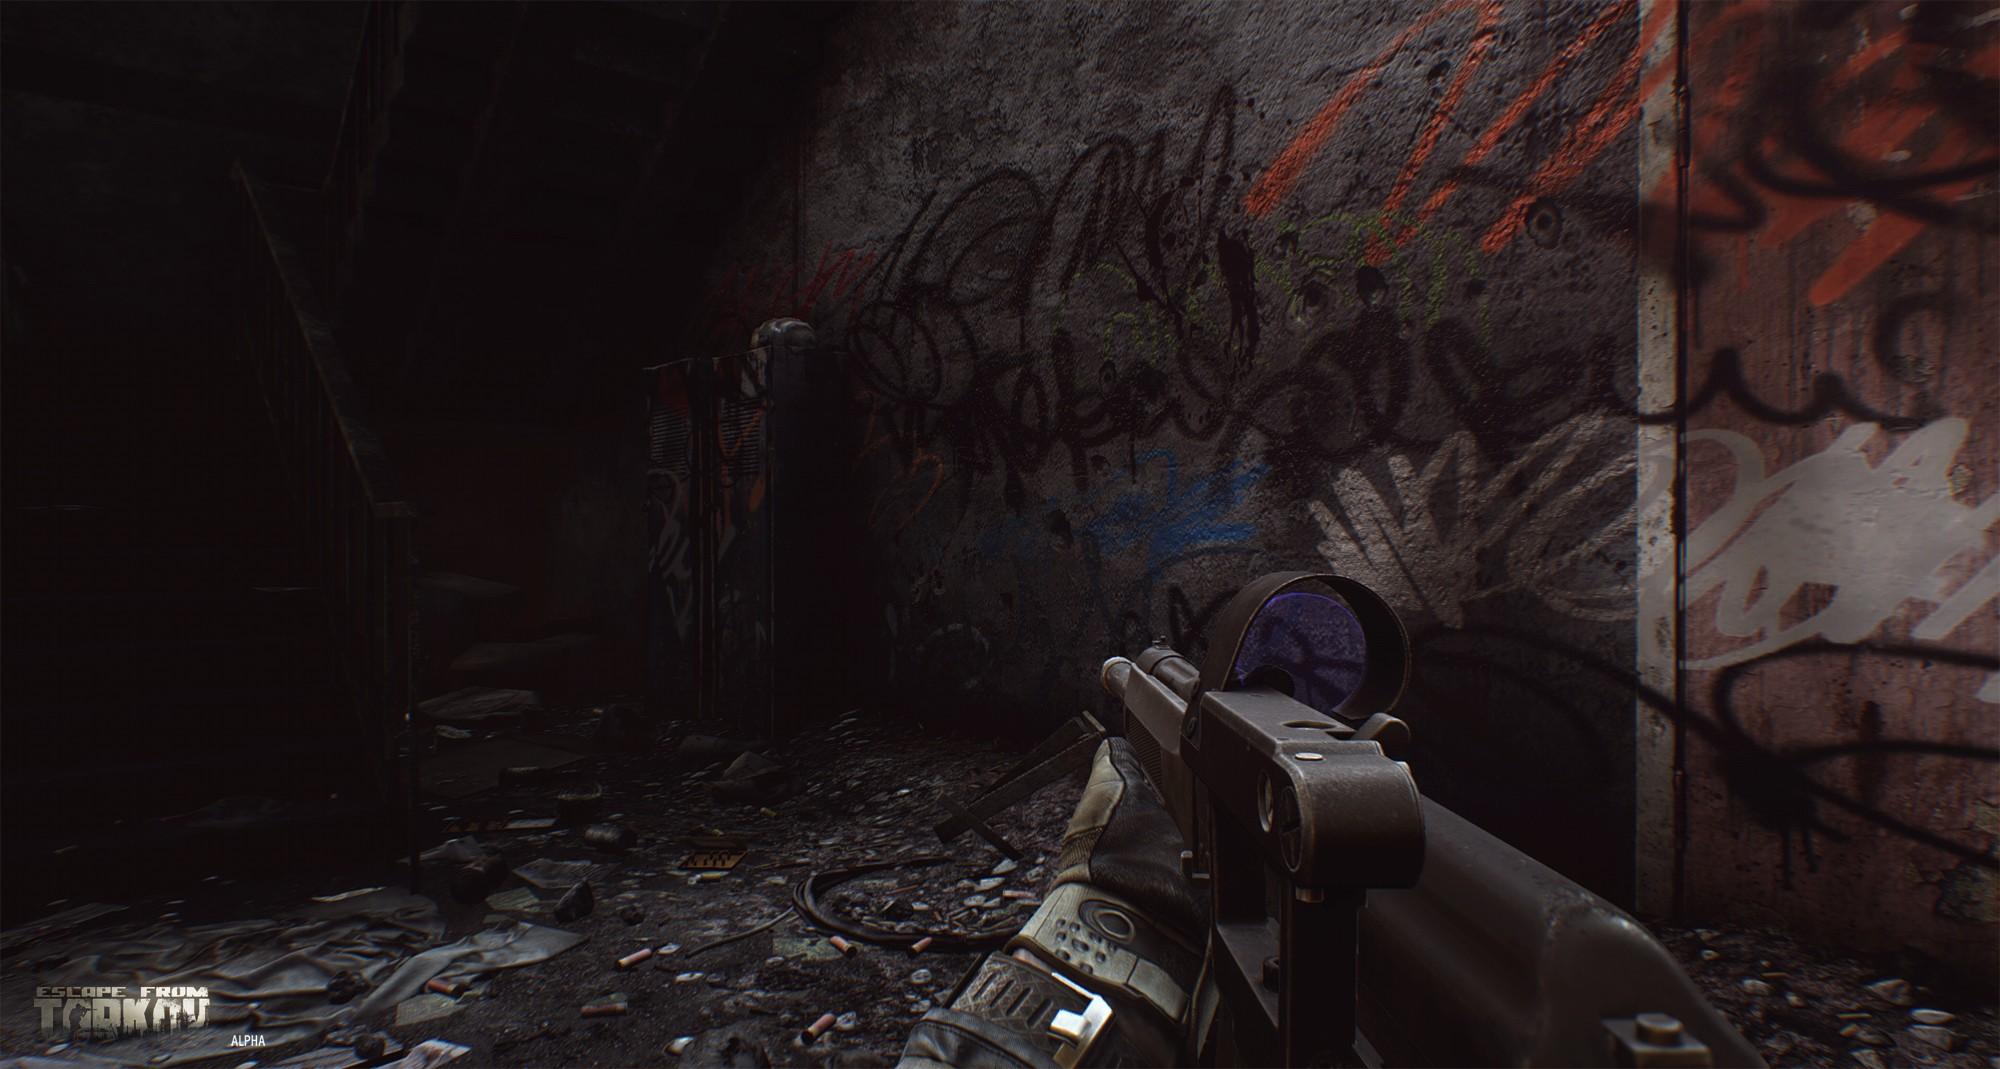 Video Games Escape From Tarkov Videojuegos War Game Tactical Mmorpg Midnight First Darkness Screenshot Pc